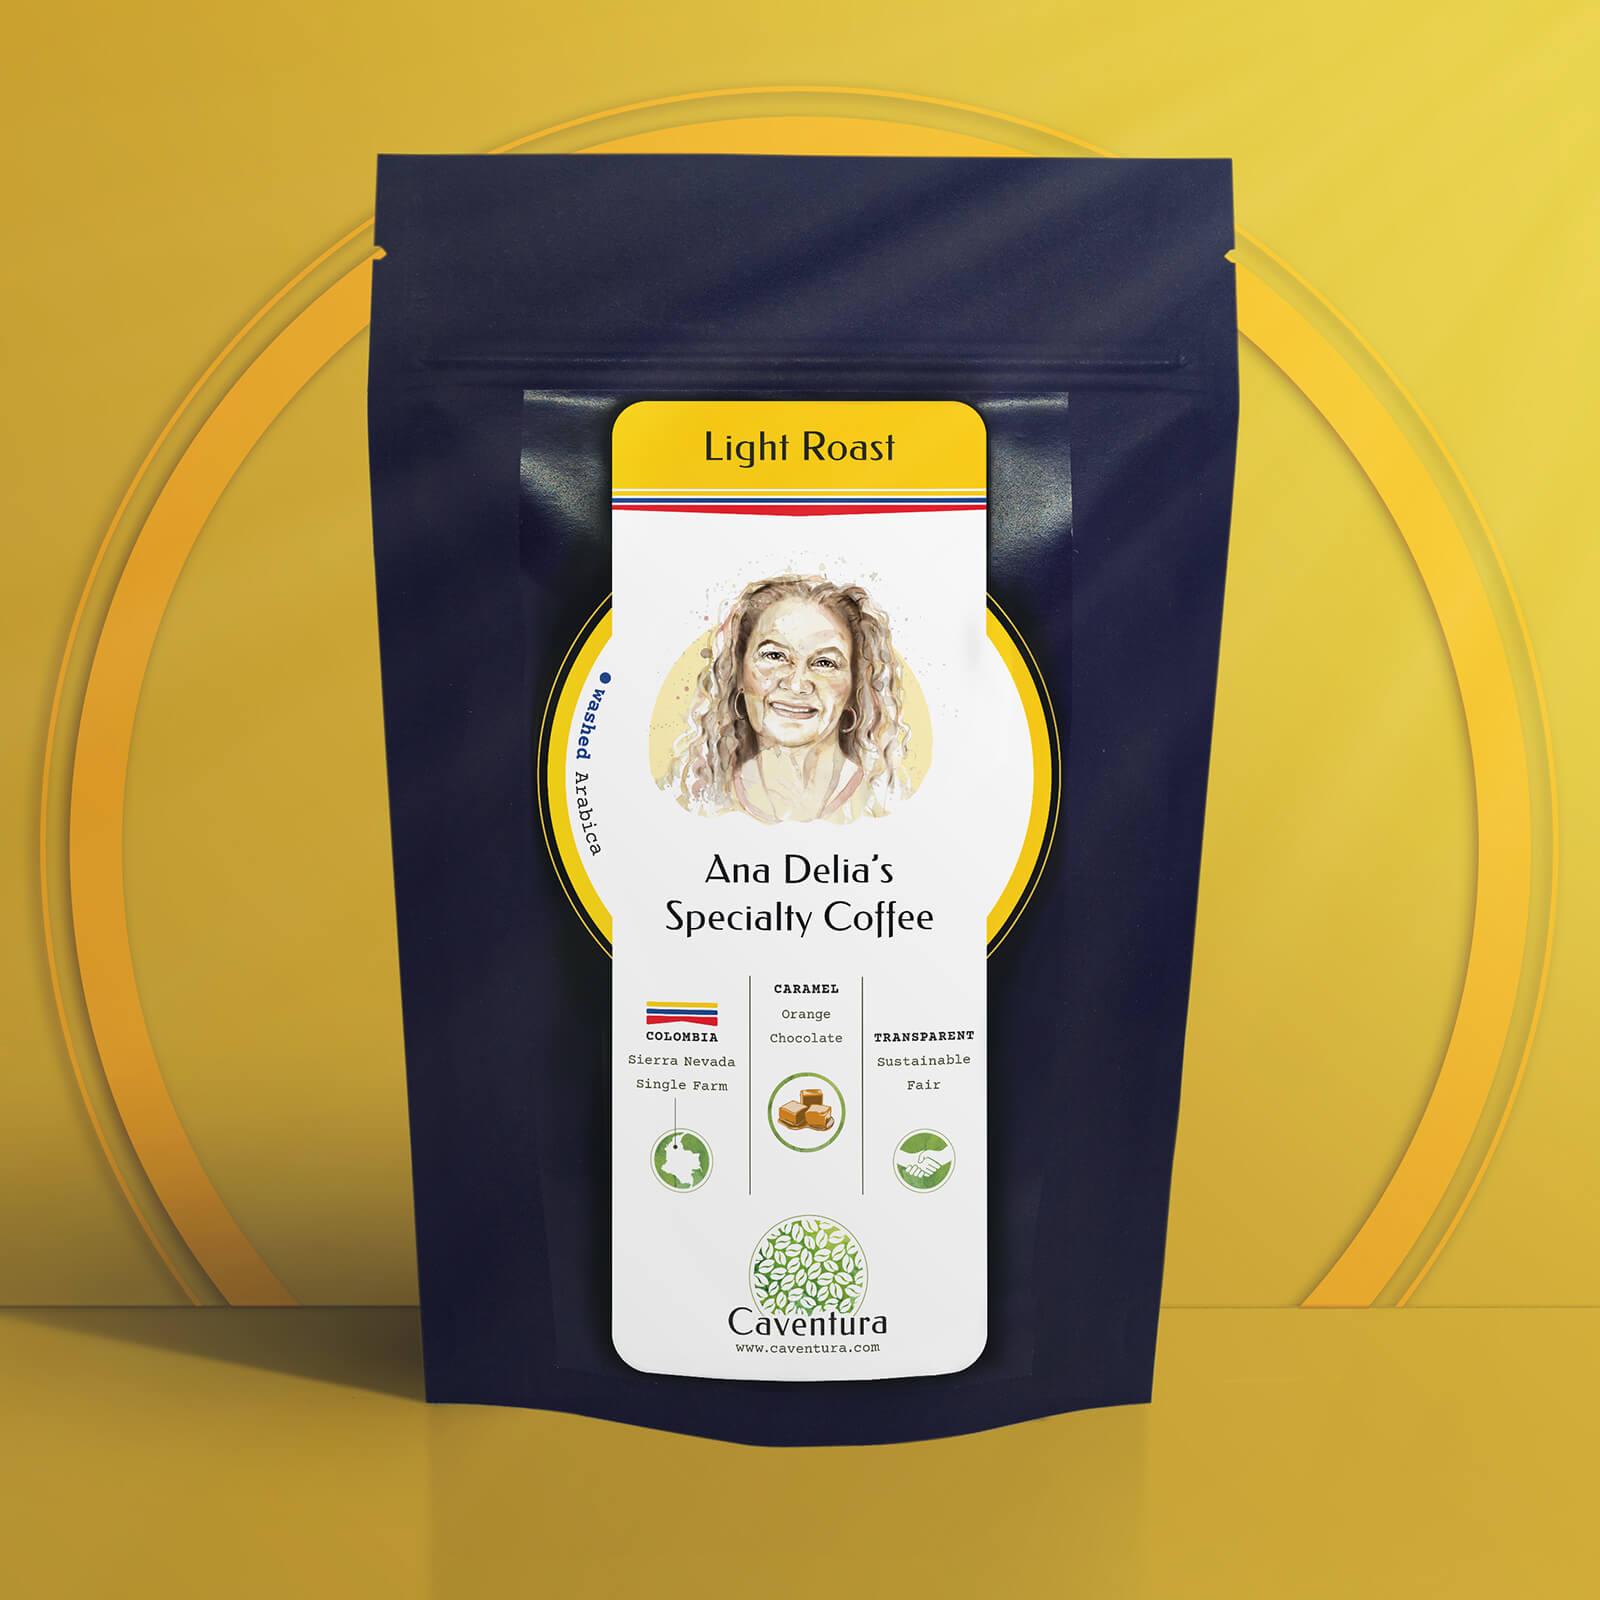 Ana Delia's Specialty Coffee – Light Roast